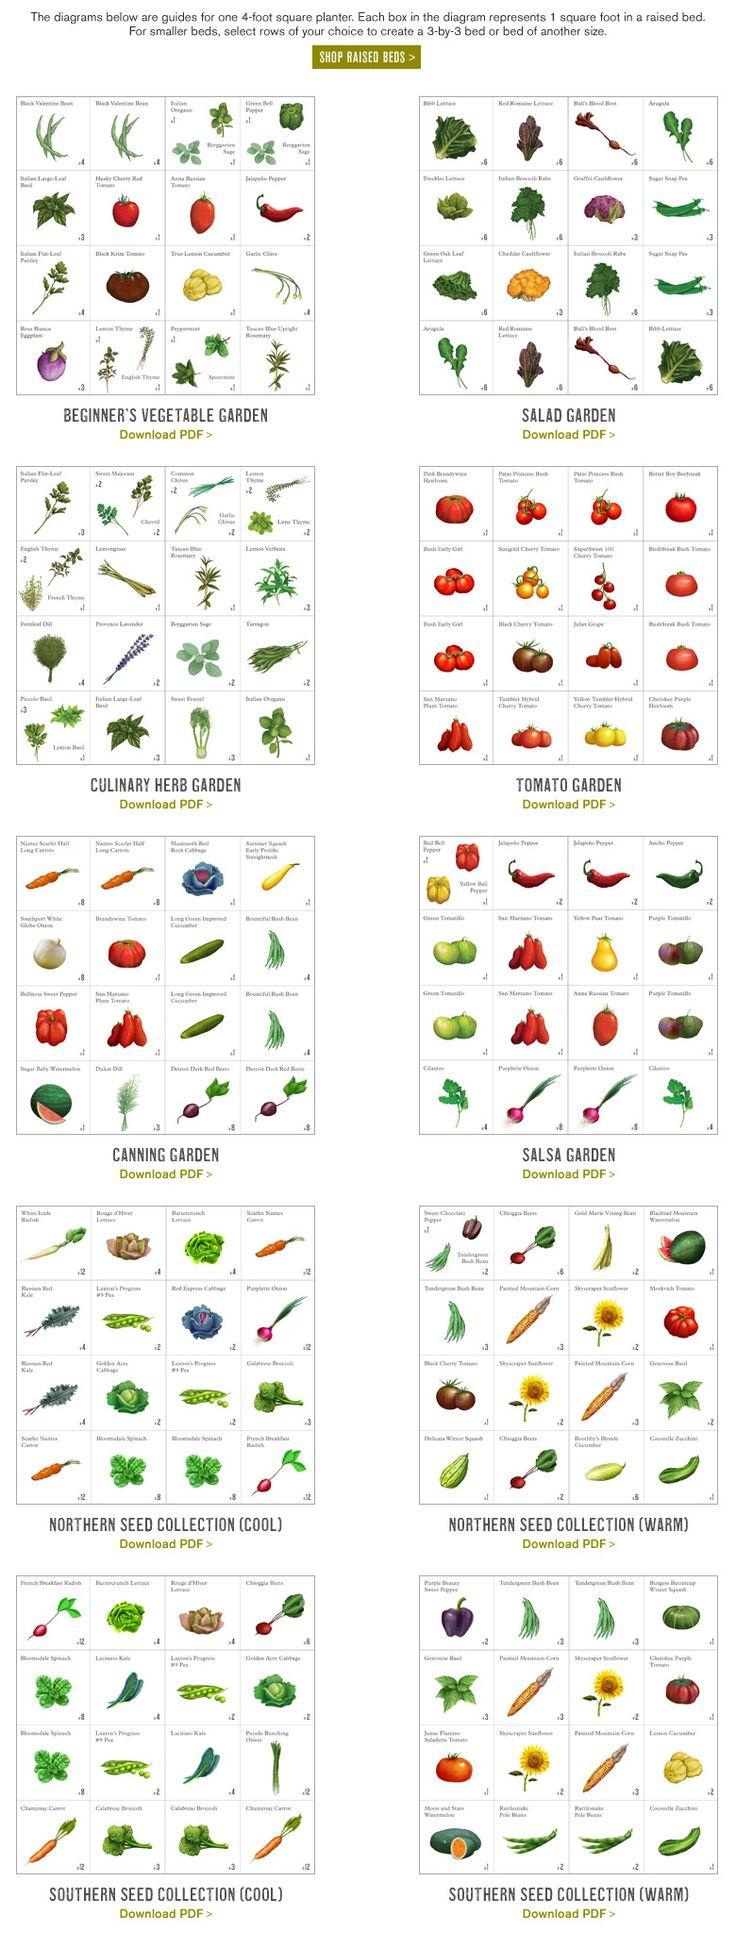 Beginner's vegetable garden, salad garden, herb garden, tomato garden, canning garden, salsa garden, northern and southern seed